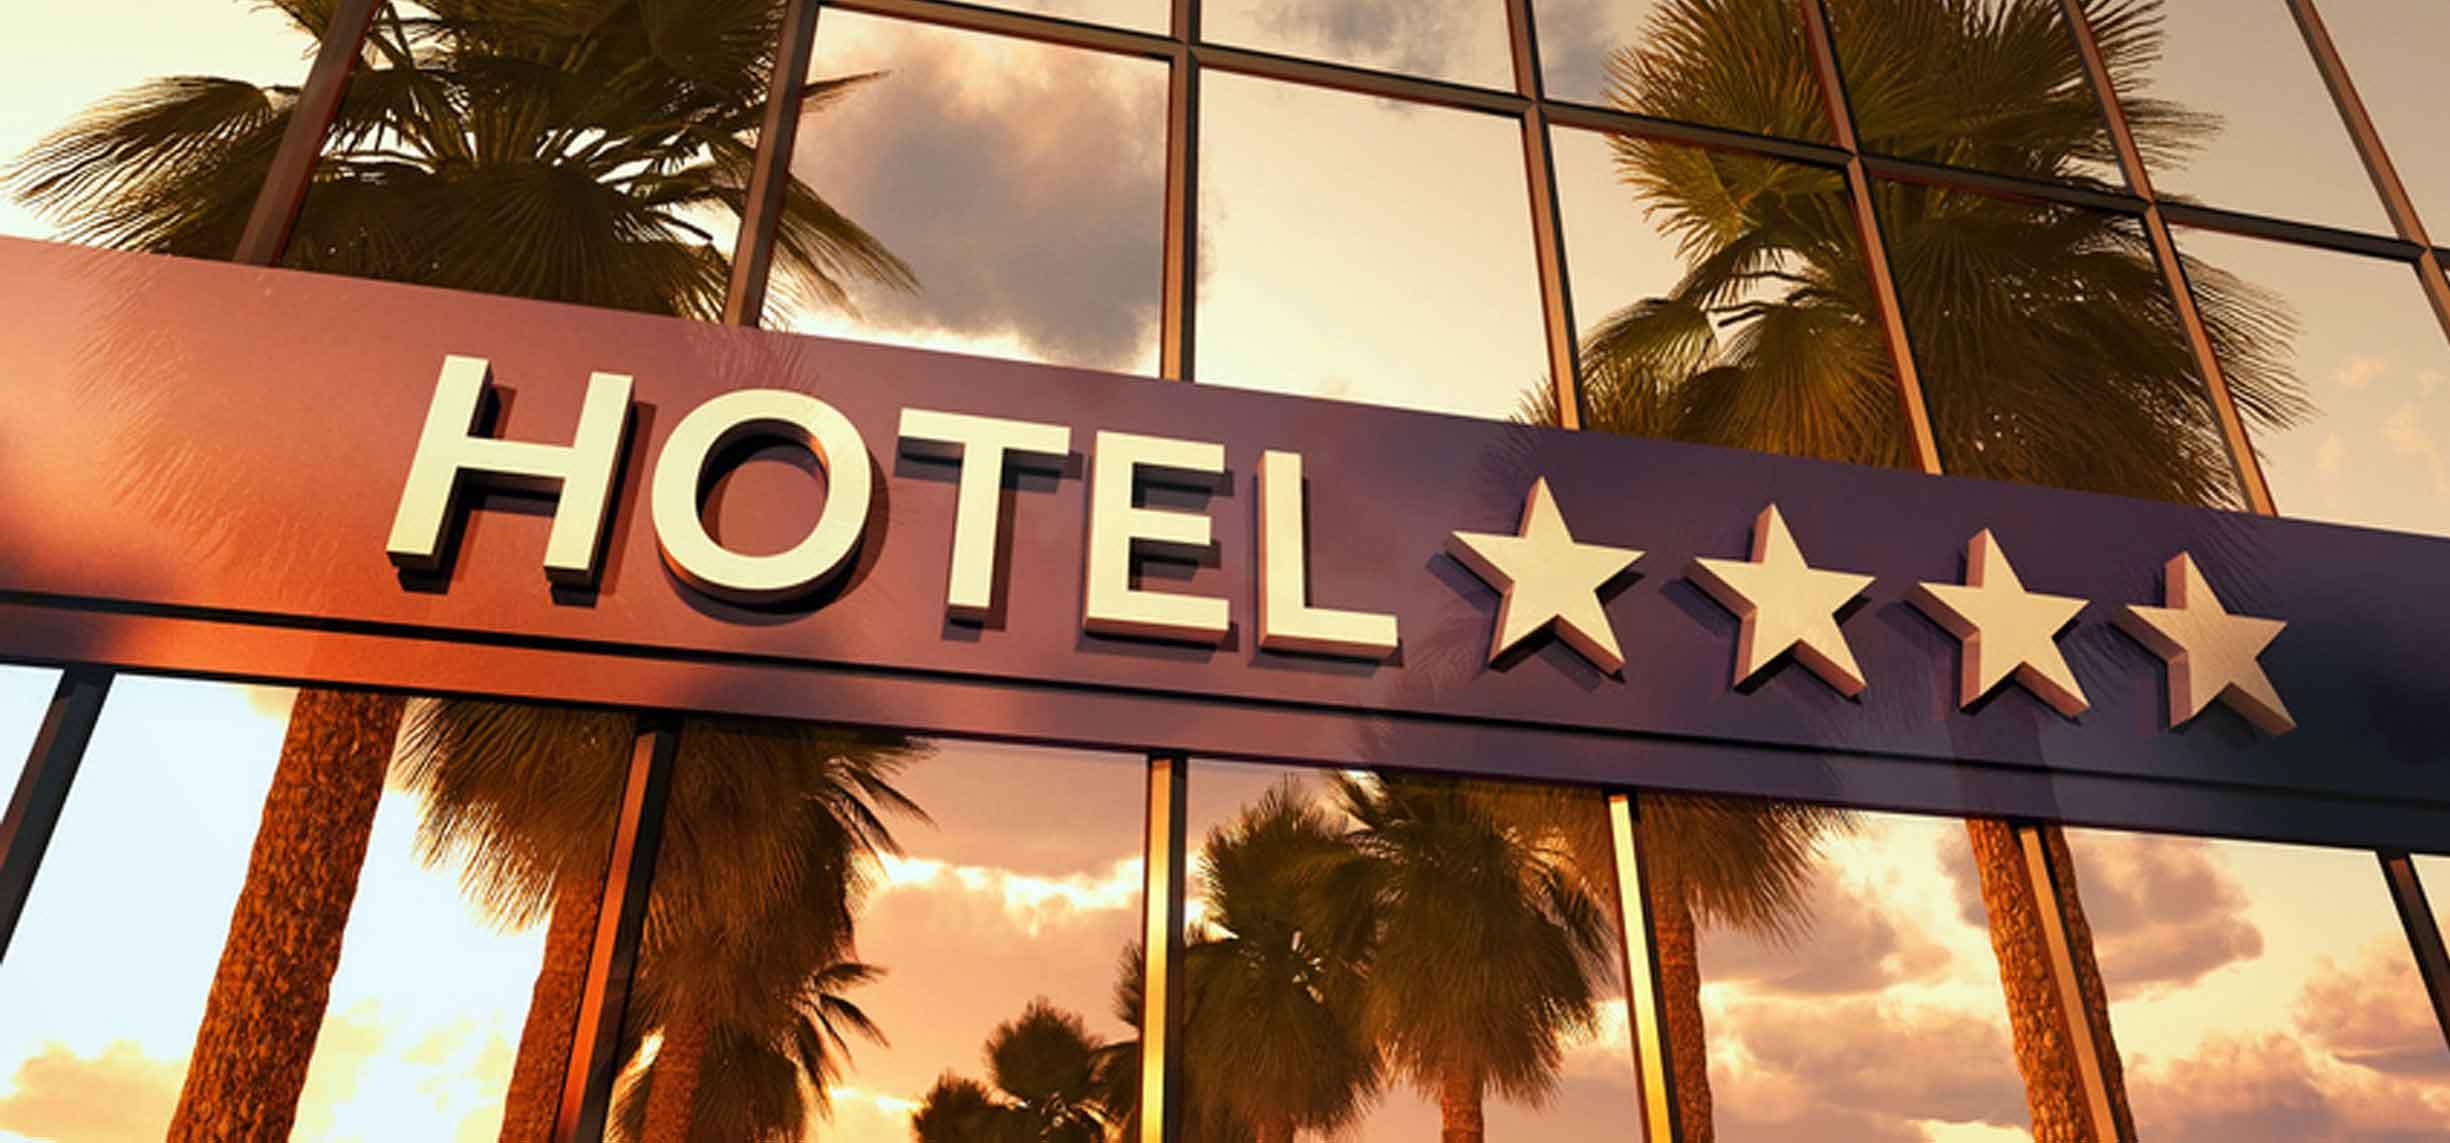 Hotelfilme